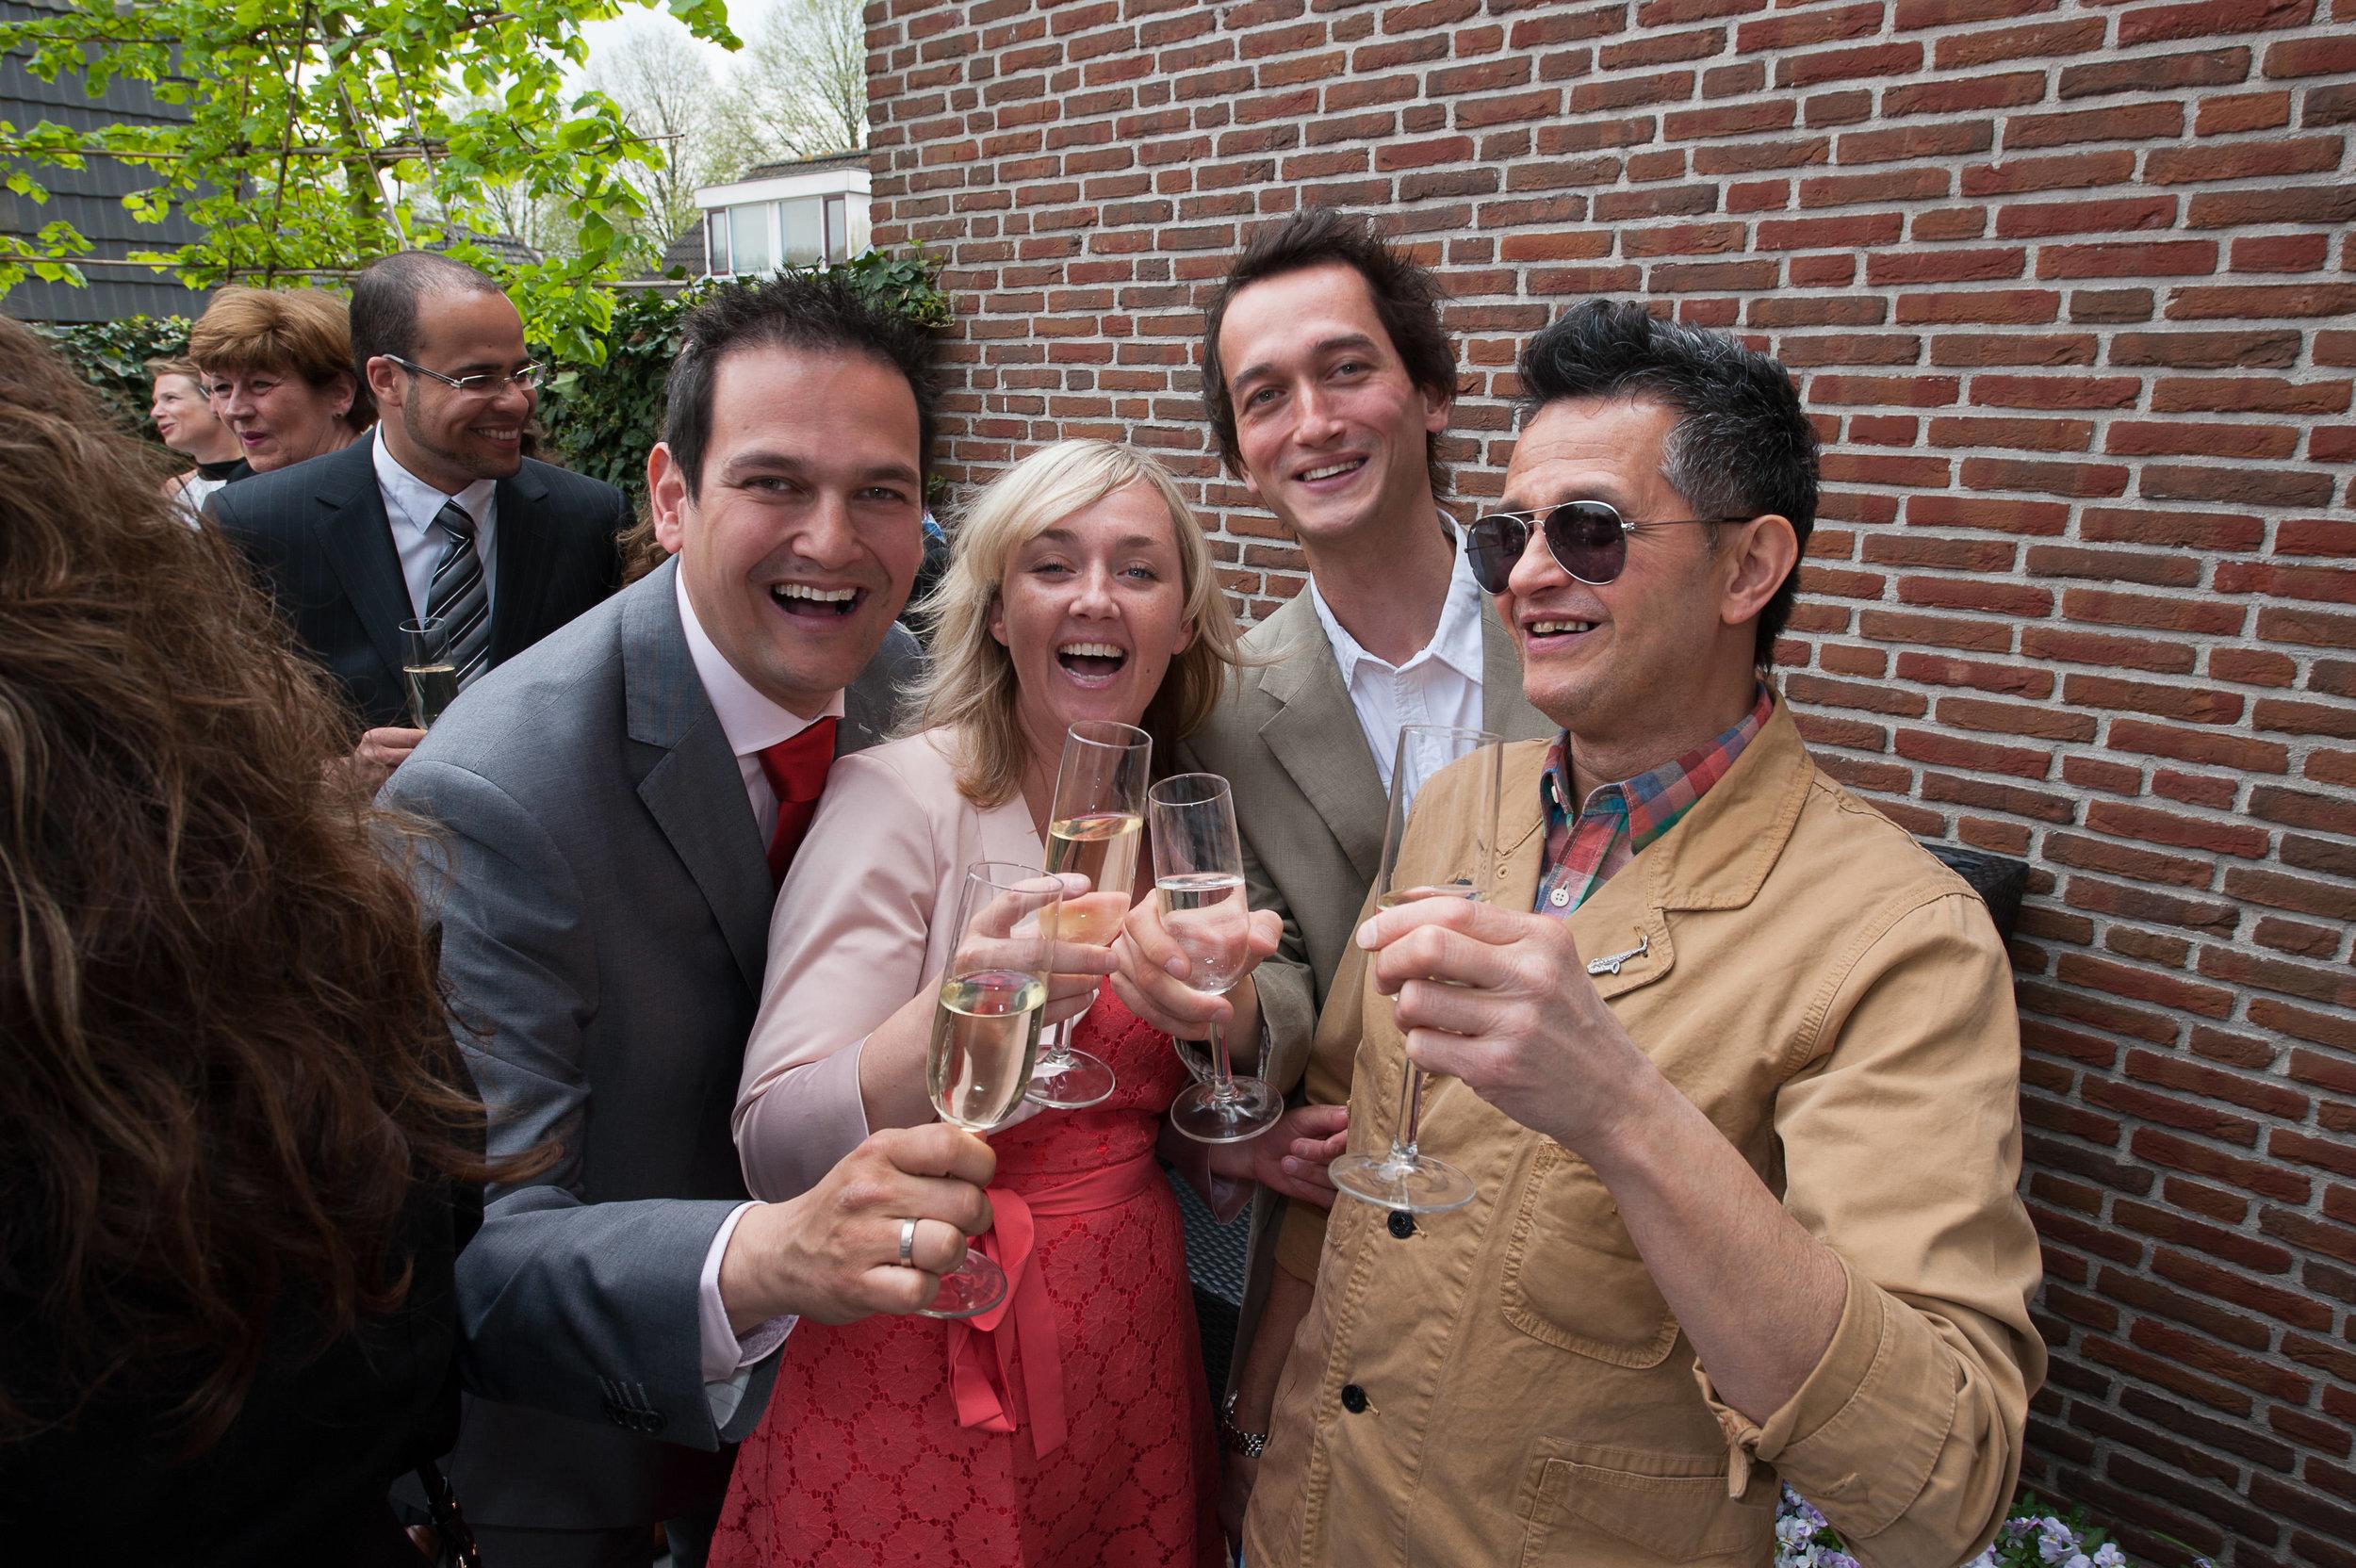 trouwshoot-bruidsfotografie-trouwfoto-feestfotografie-marcel en desiree-290.jpg